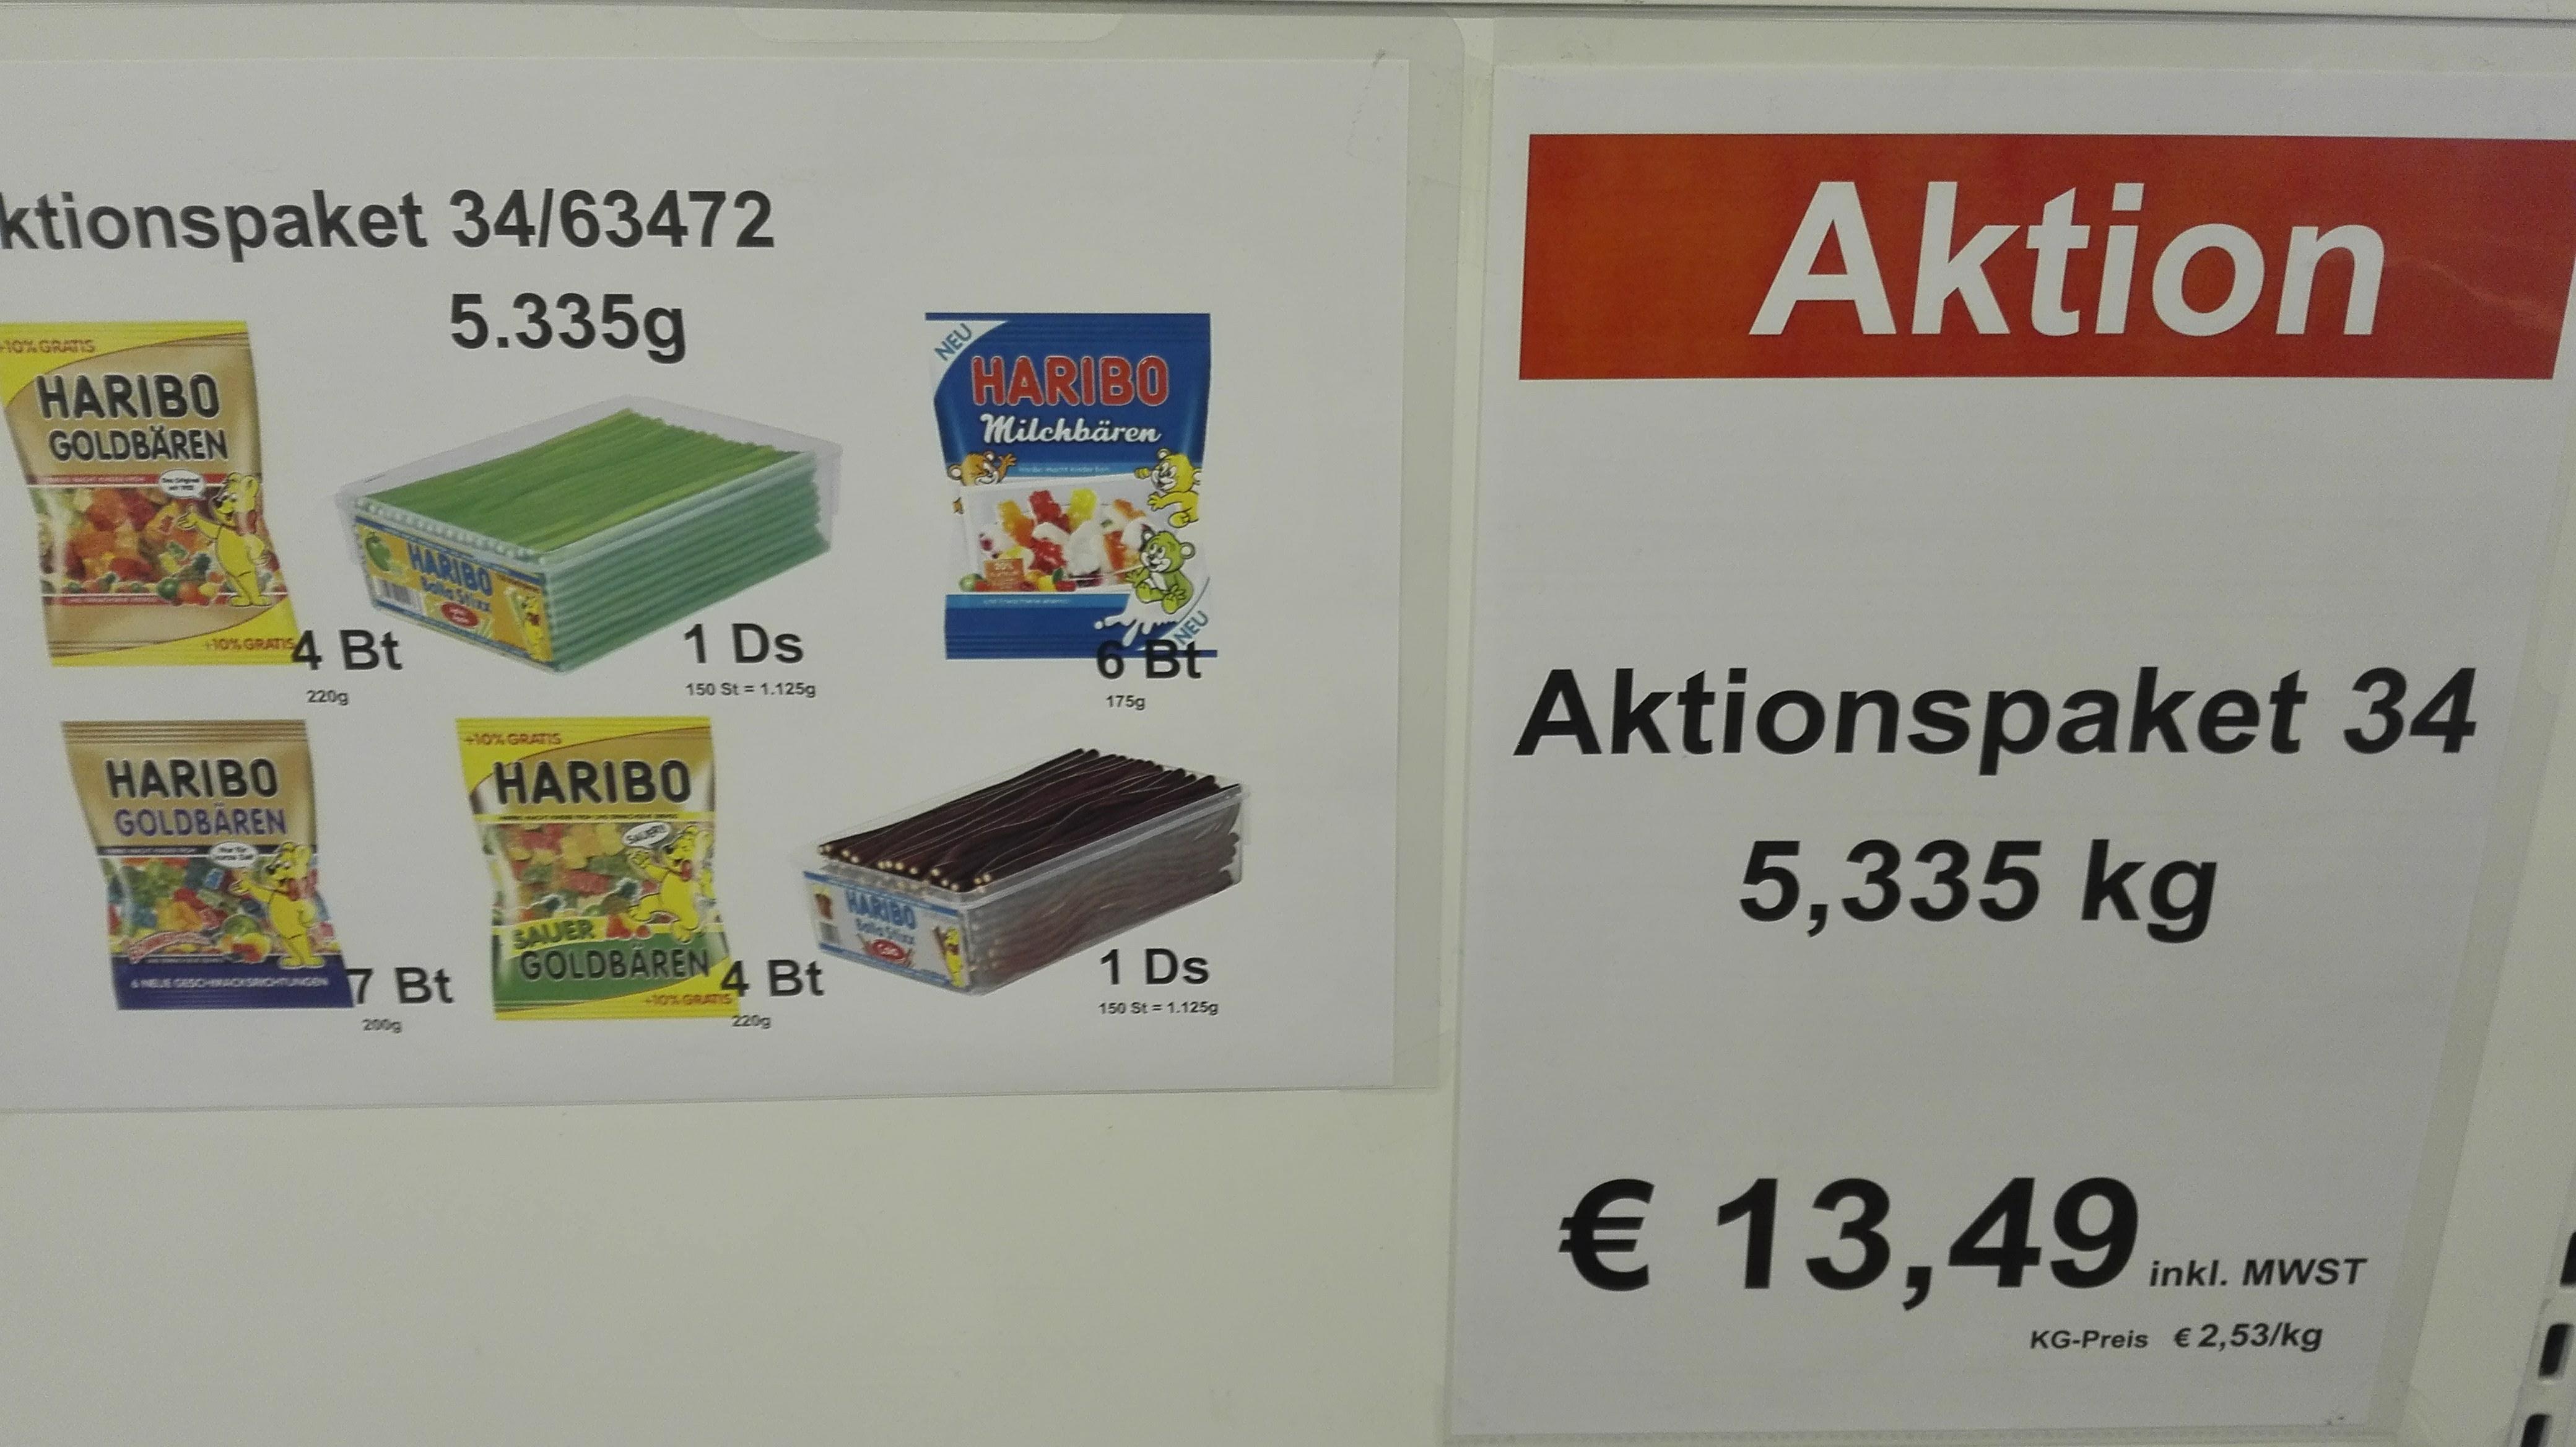 Original Haribo Preishammer - 2,53€ je kg